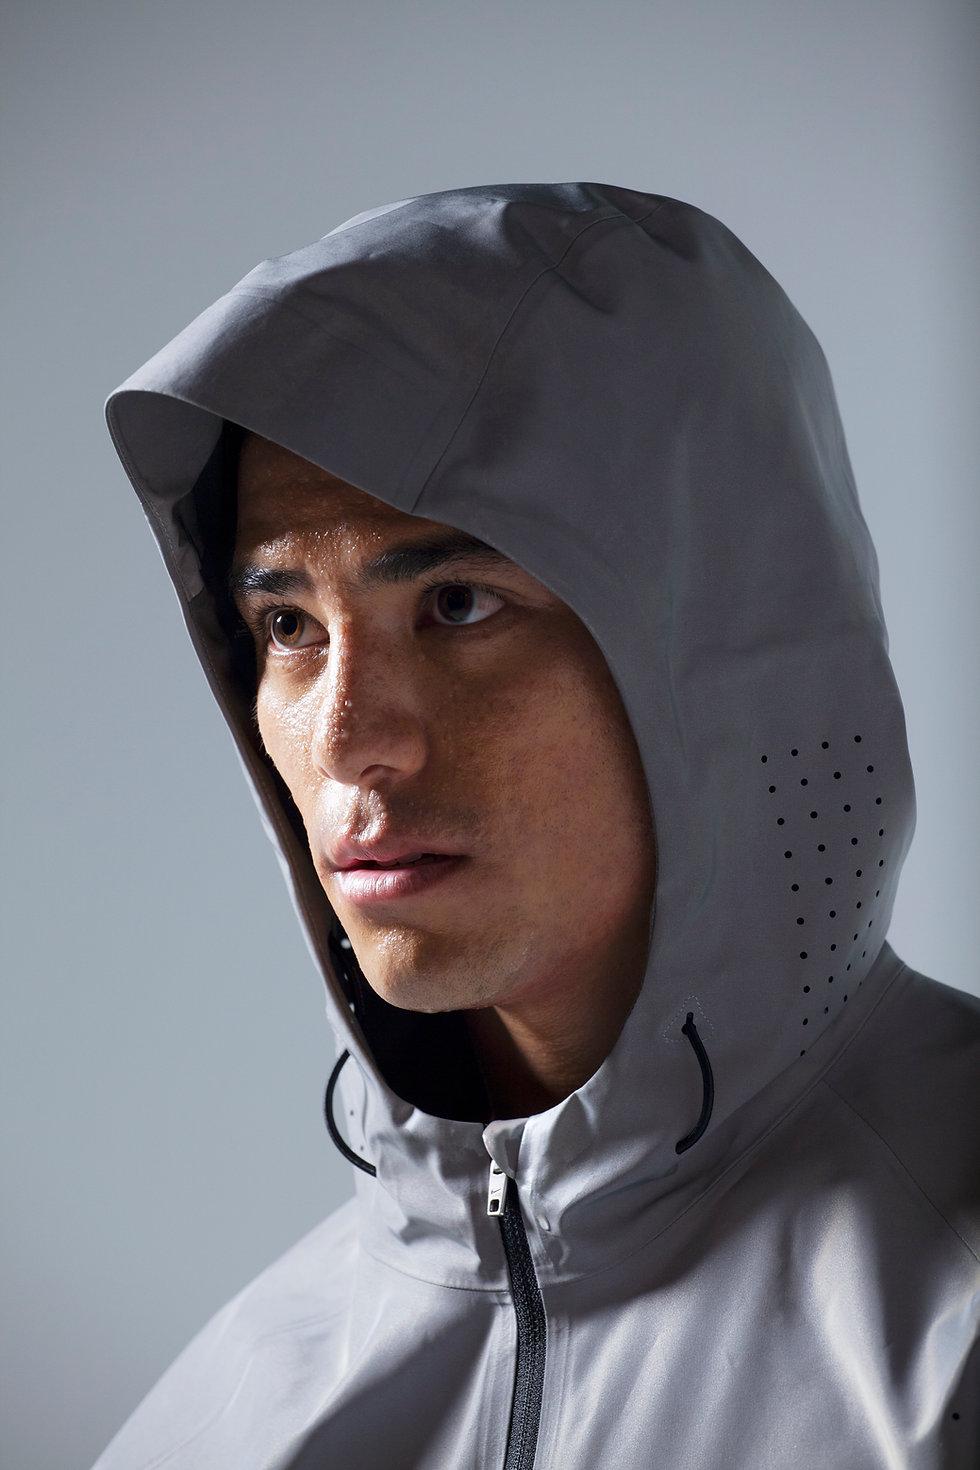 Man with running jacket - headshot